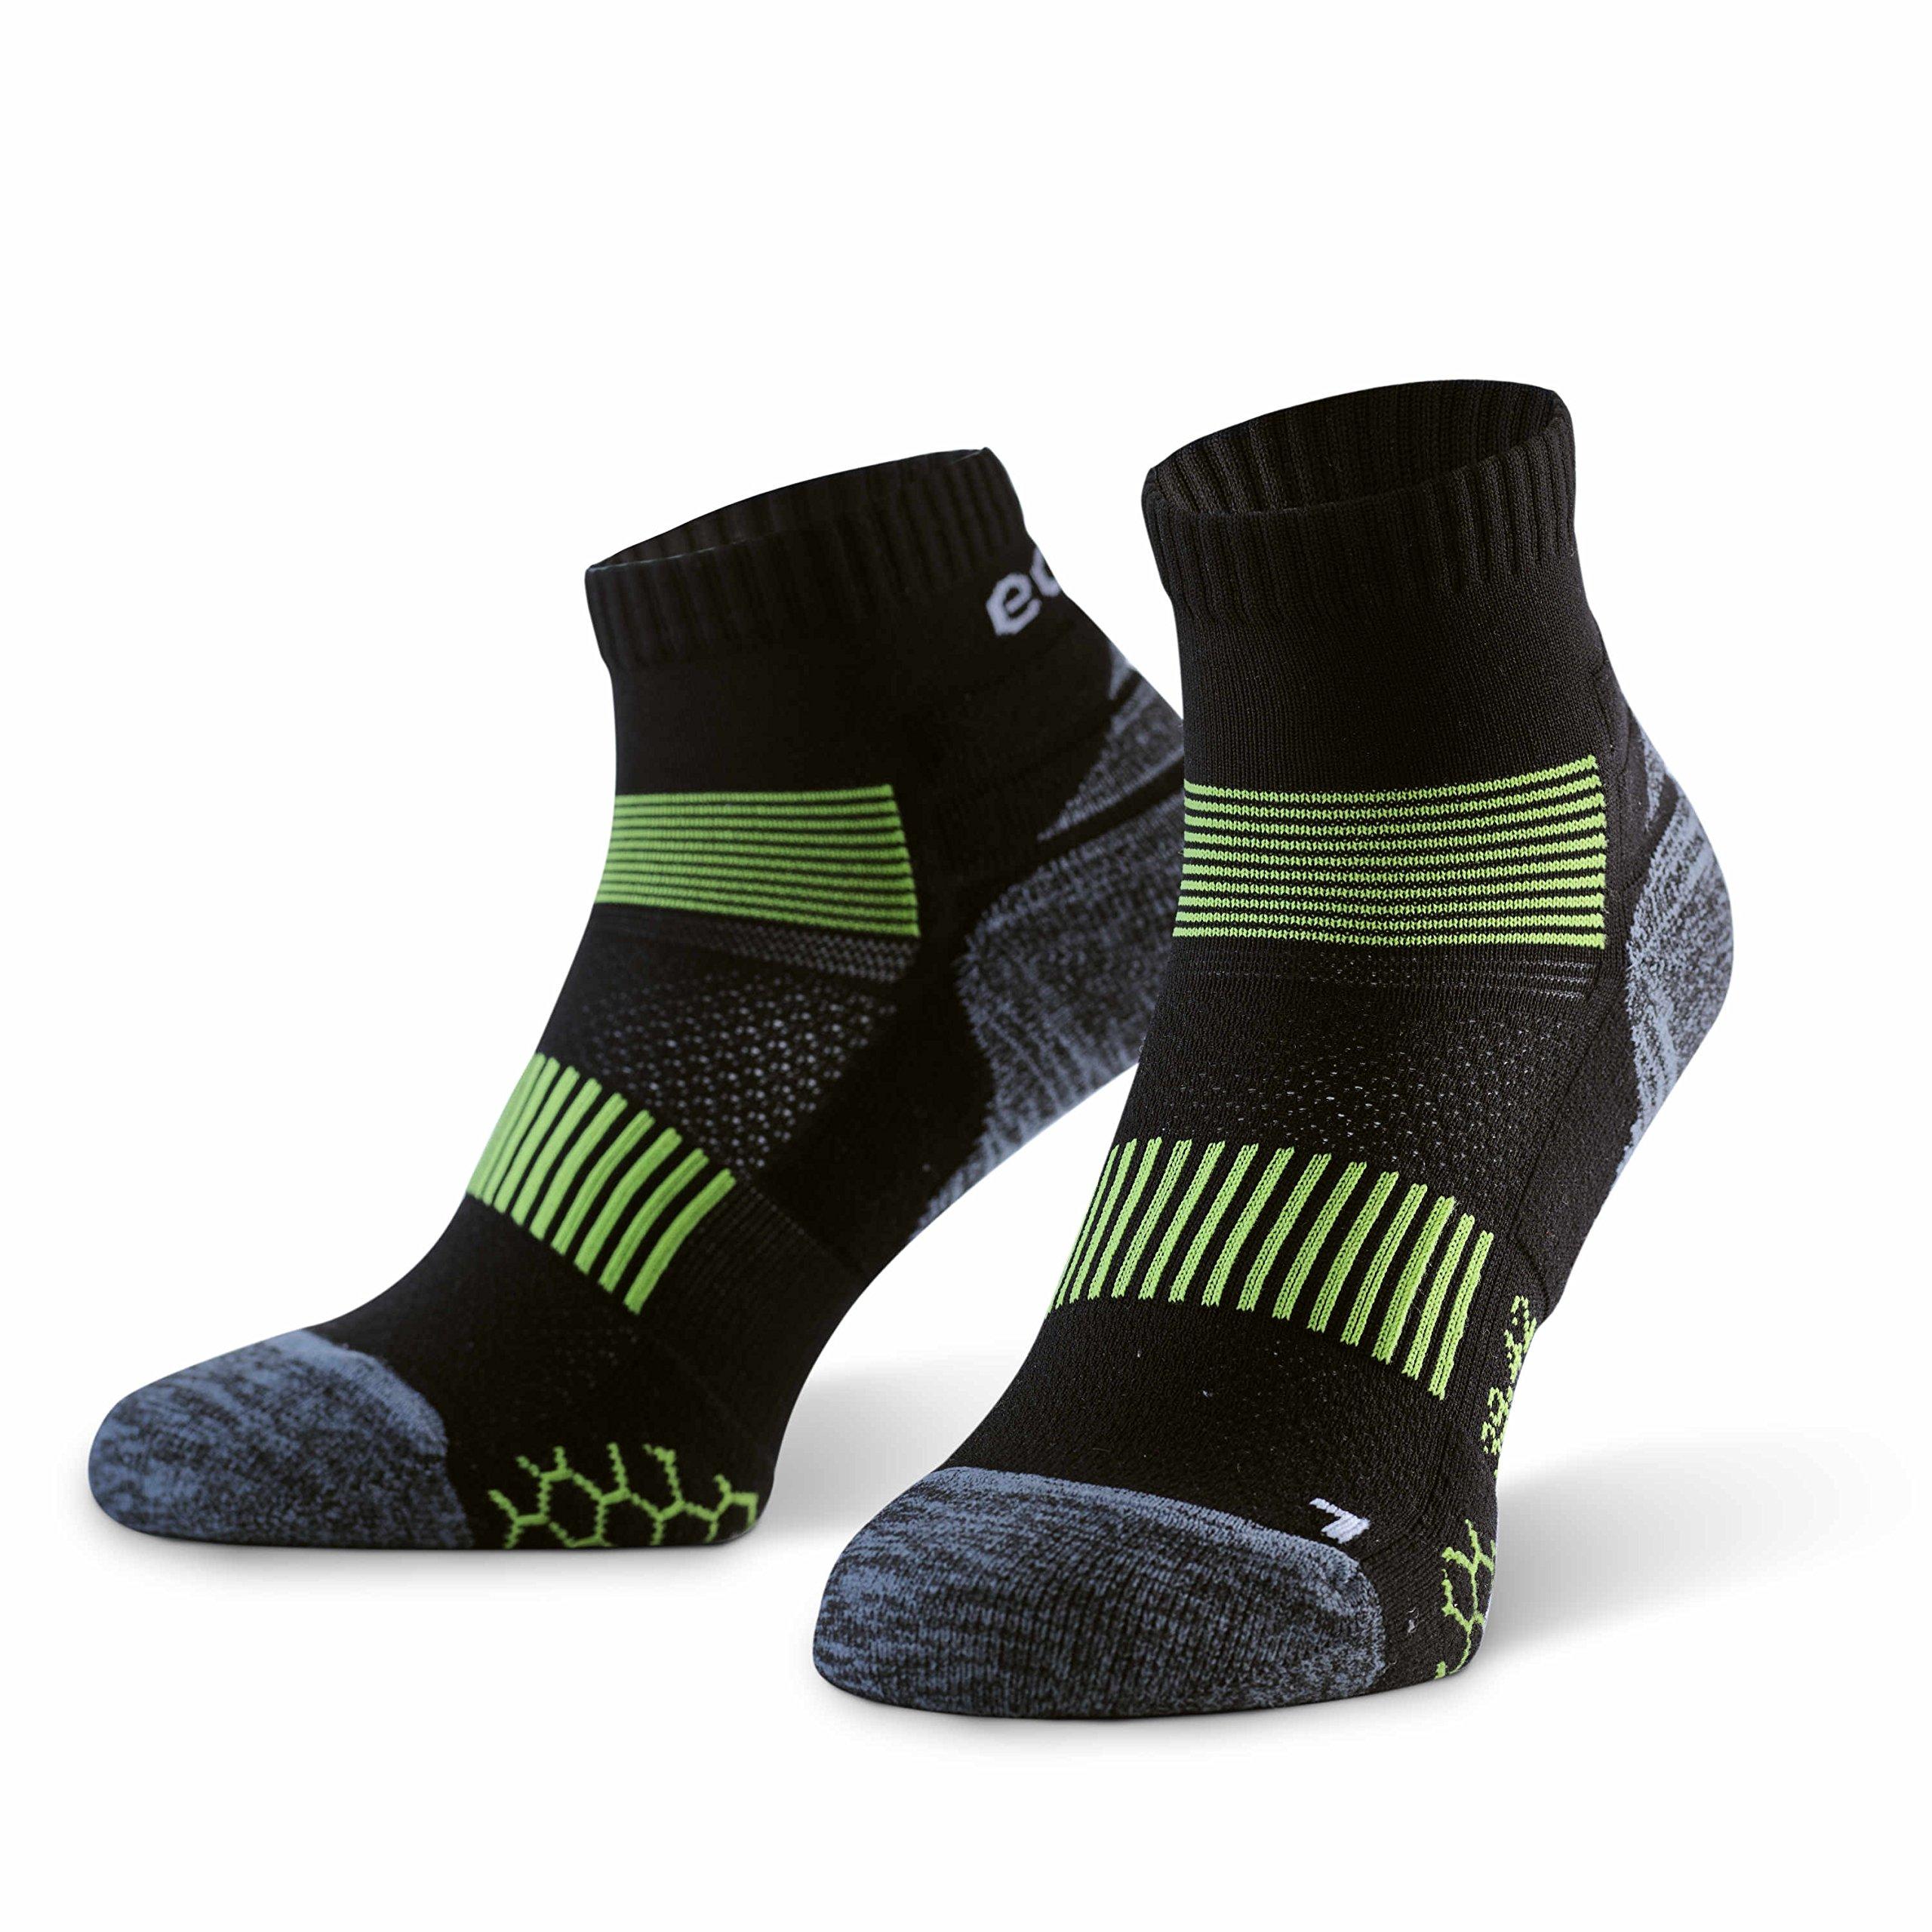 Kurze Sportsocken f/ür Dein Workout CEP 2er Pack Low Cut Socks 3.0 f/ür Herren